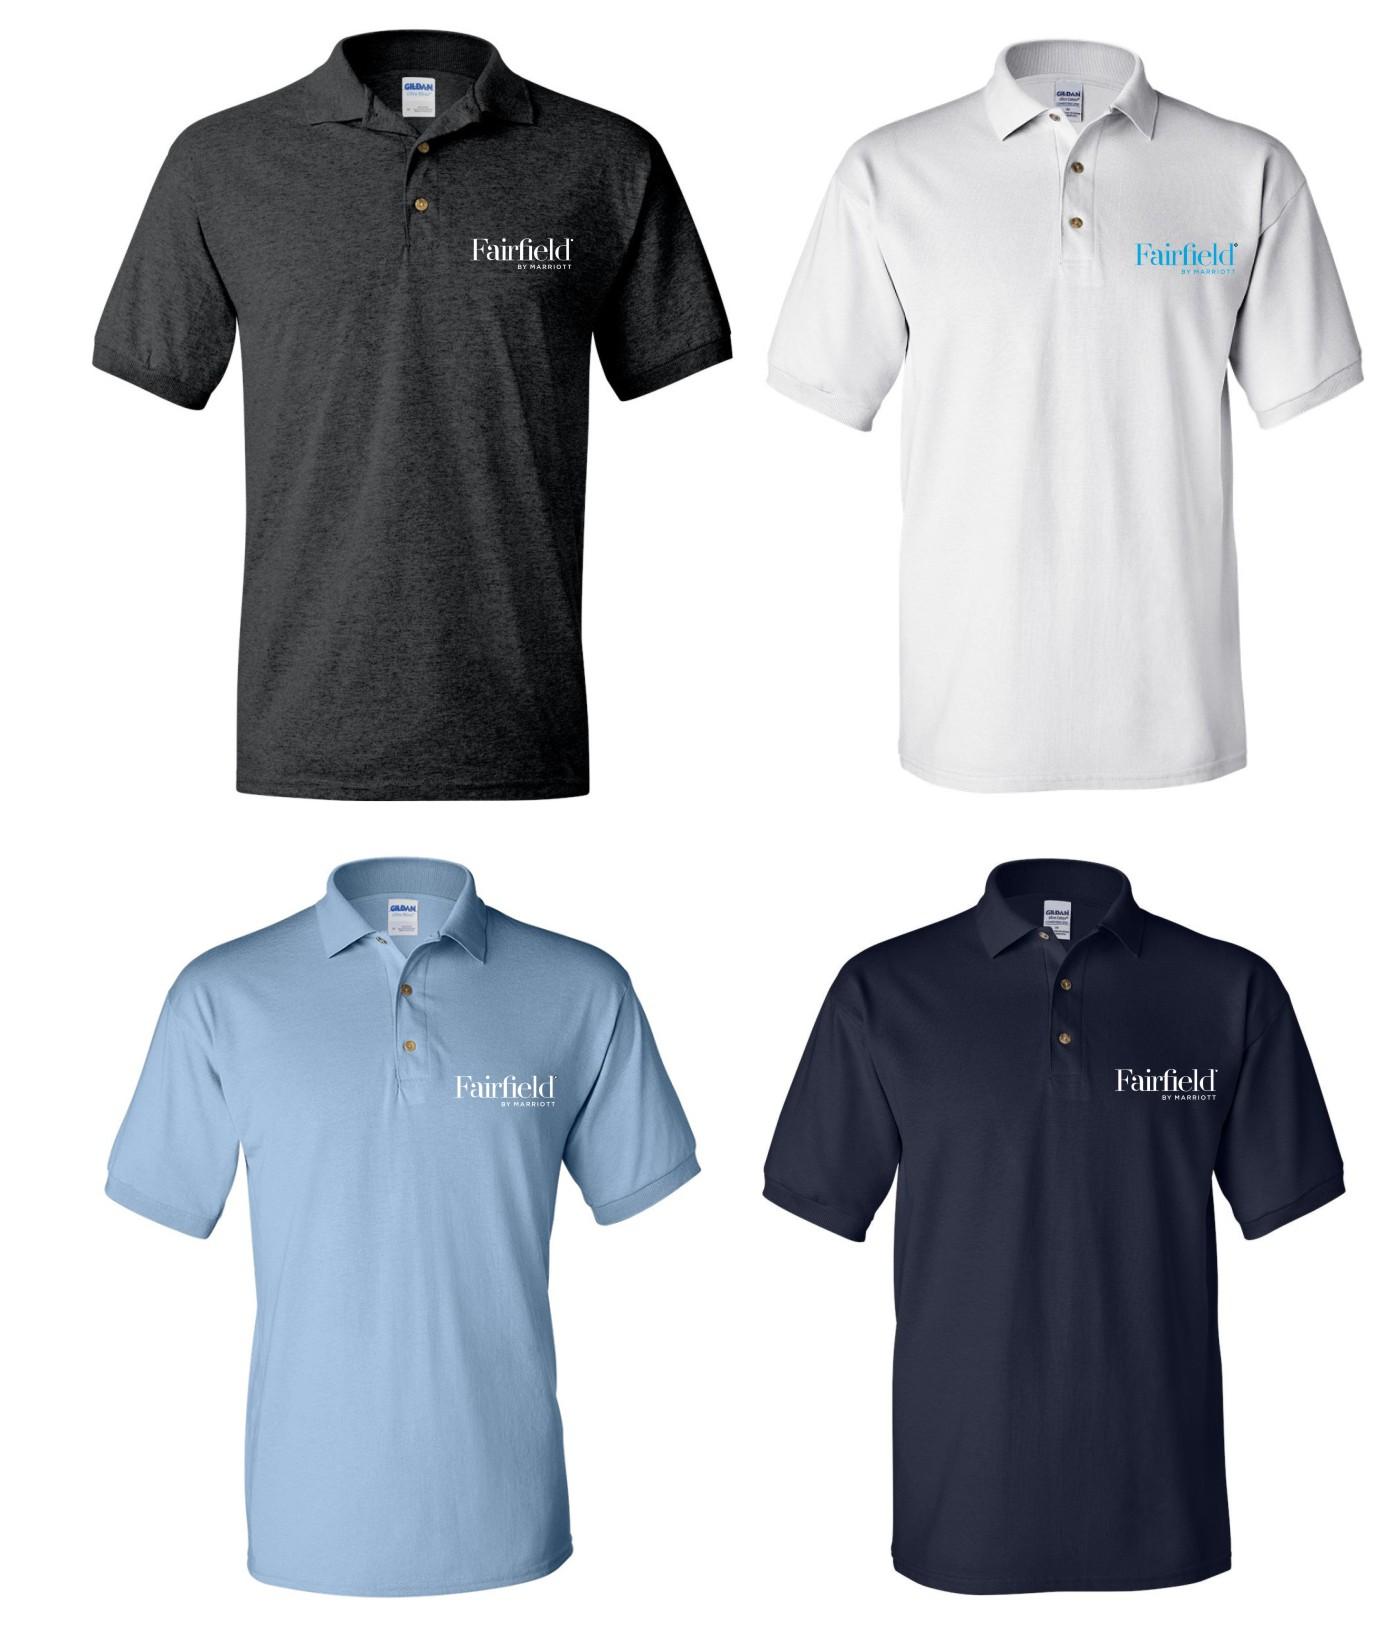 Polo Shirts. Dark Heather, White, Light Blue and Navy Blue. - Silk-Screen Logo - DryBlend Fabric 50/50 - 3-Button Placket - Knitted Collar/Cuffs